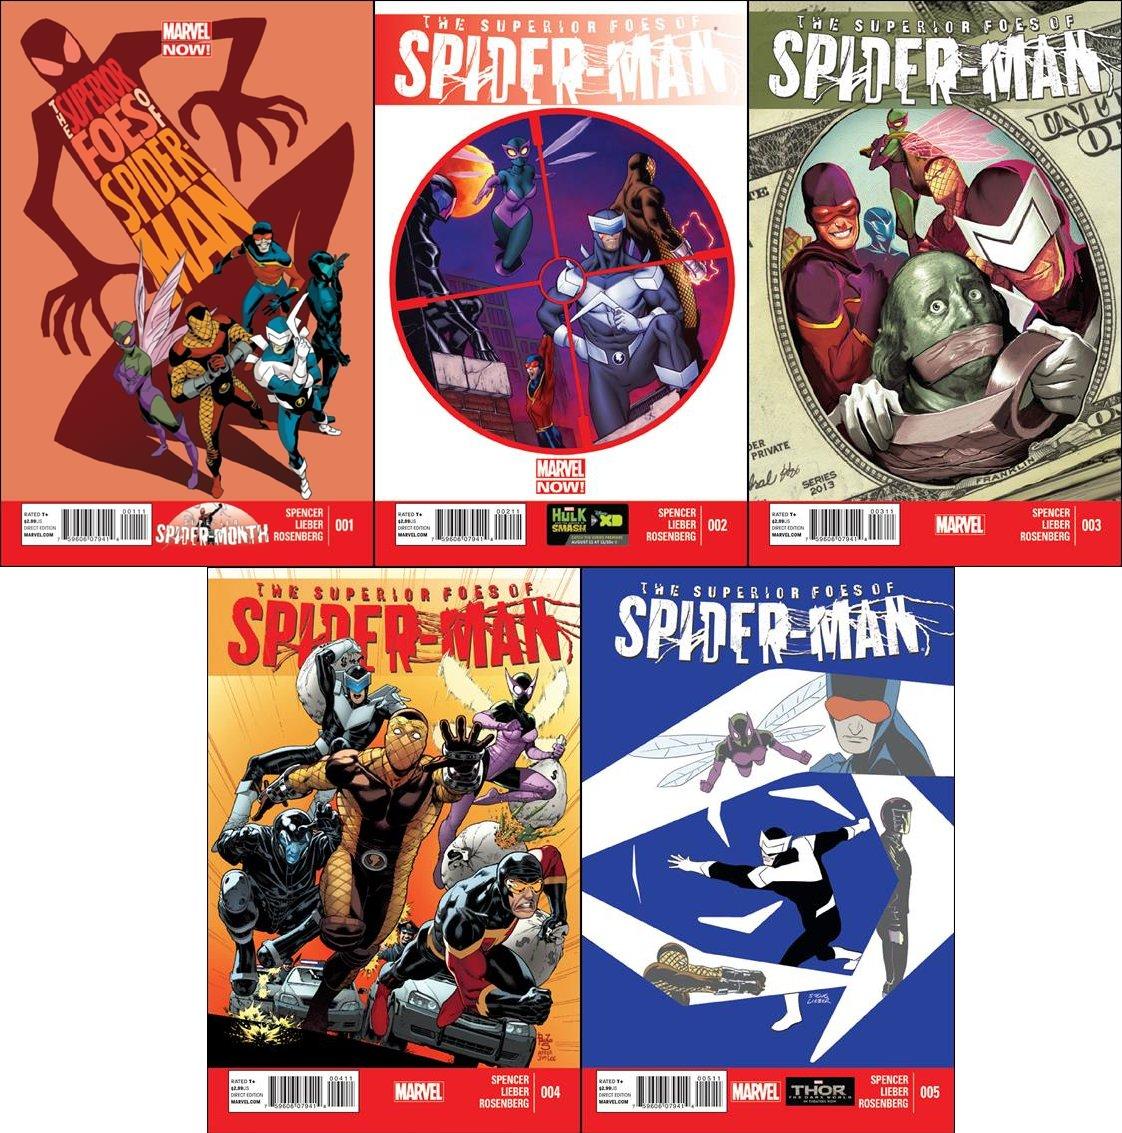 Superior Foes of Spider-Man #1 2 3 4 5 Trade Set [2013-2014] VF/NM Marvel Comics